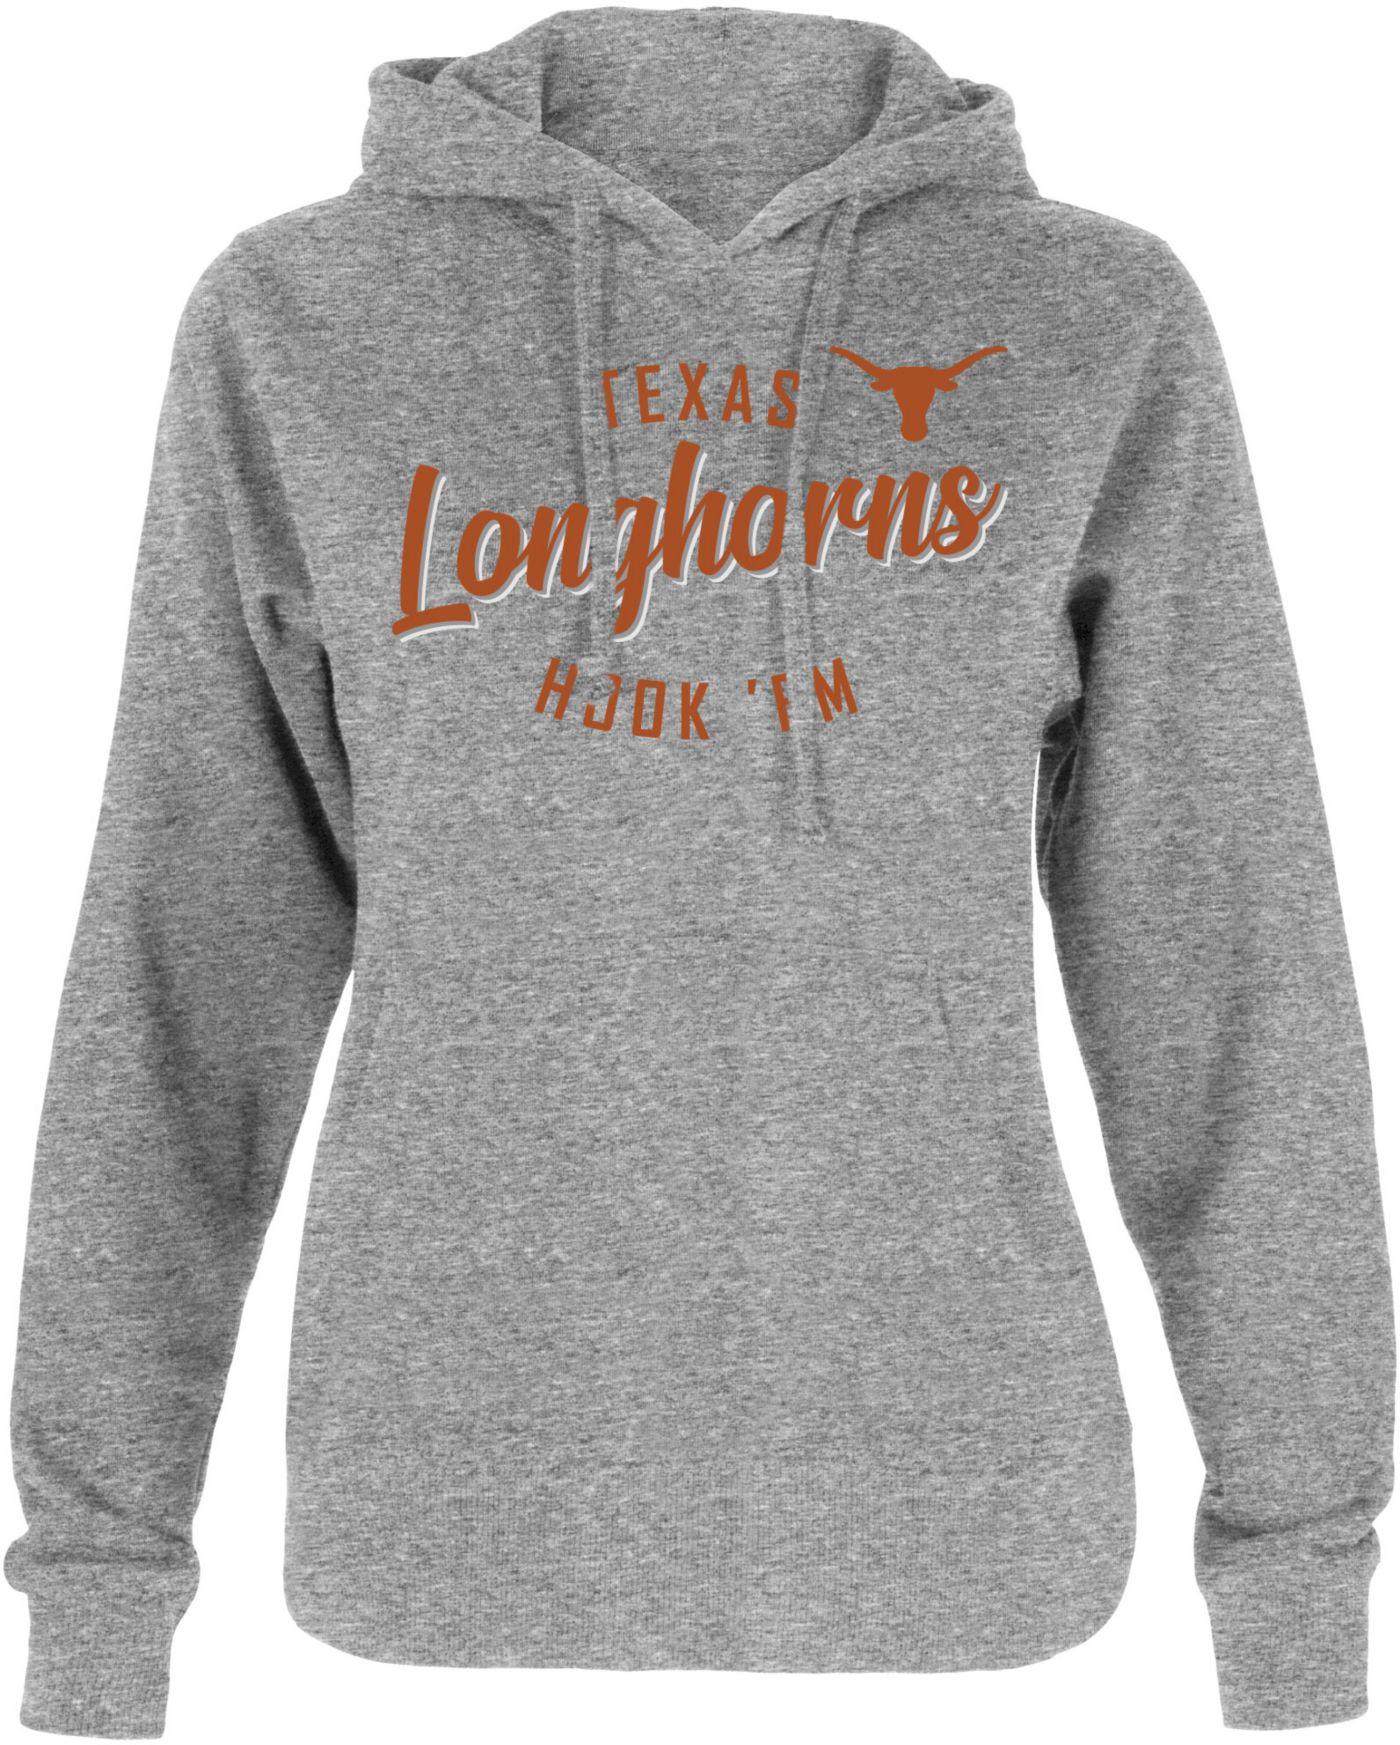 University of Texas Authentic Apparel Women's Texas Longhorns Grey Hoodie